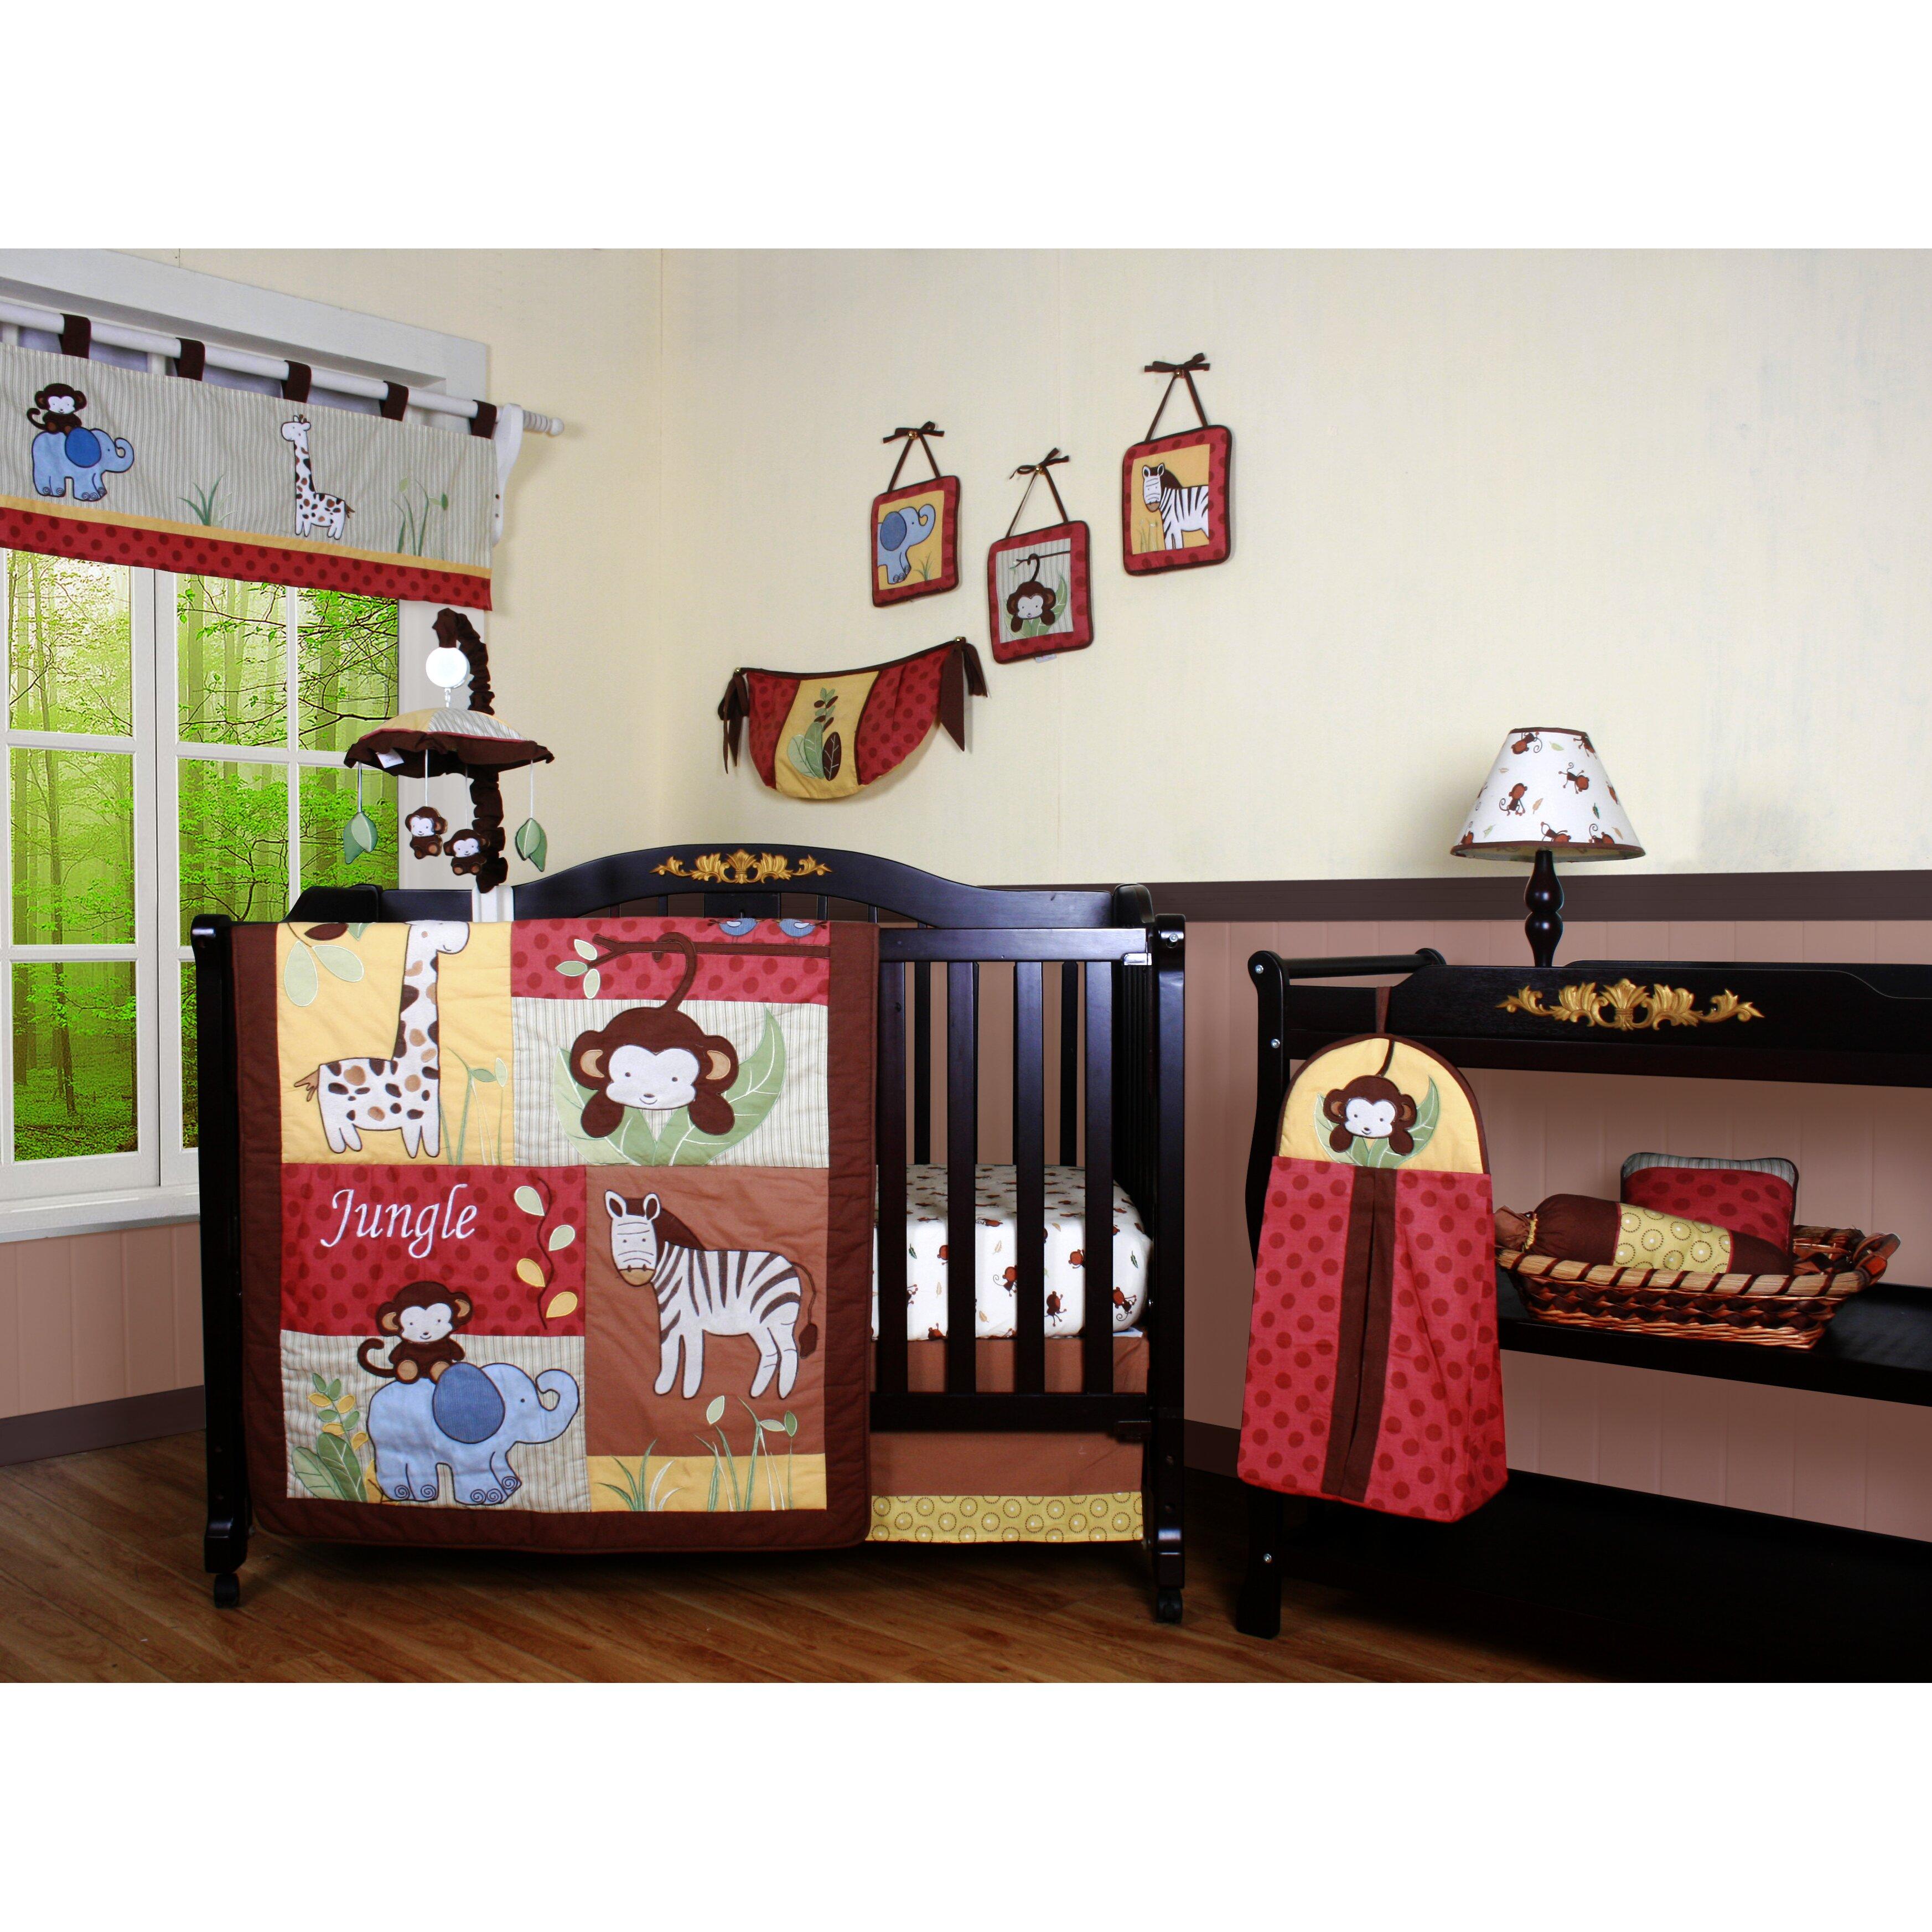 Geenny boutique amazon jungle animal 13 piece crib bedding set reviews wayfair - Geenny crib bedding sets ...